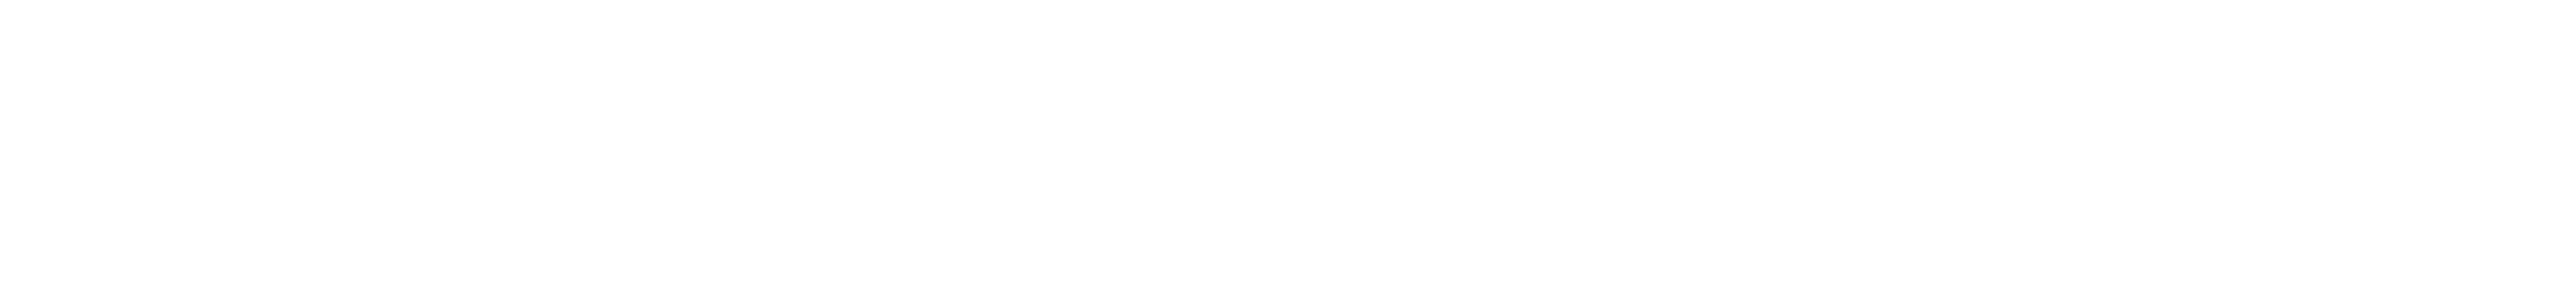 logo_18.ai